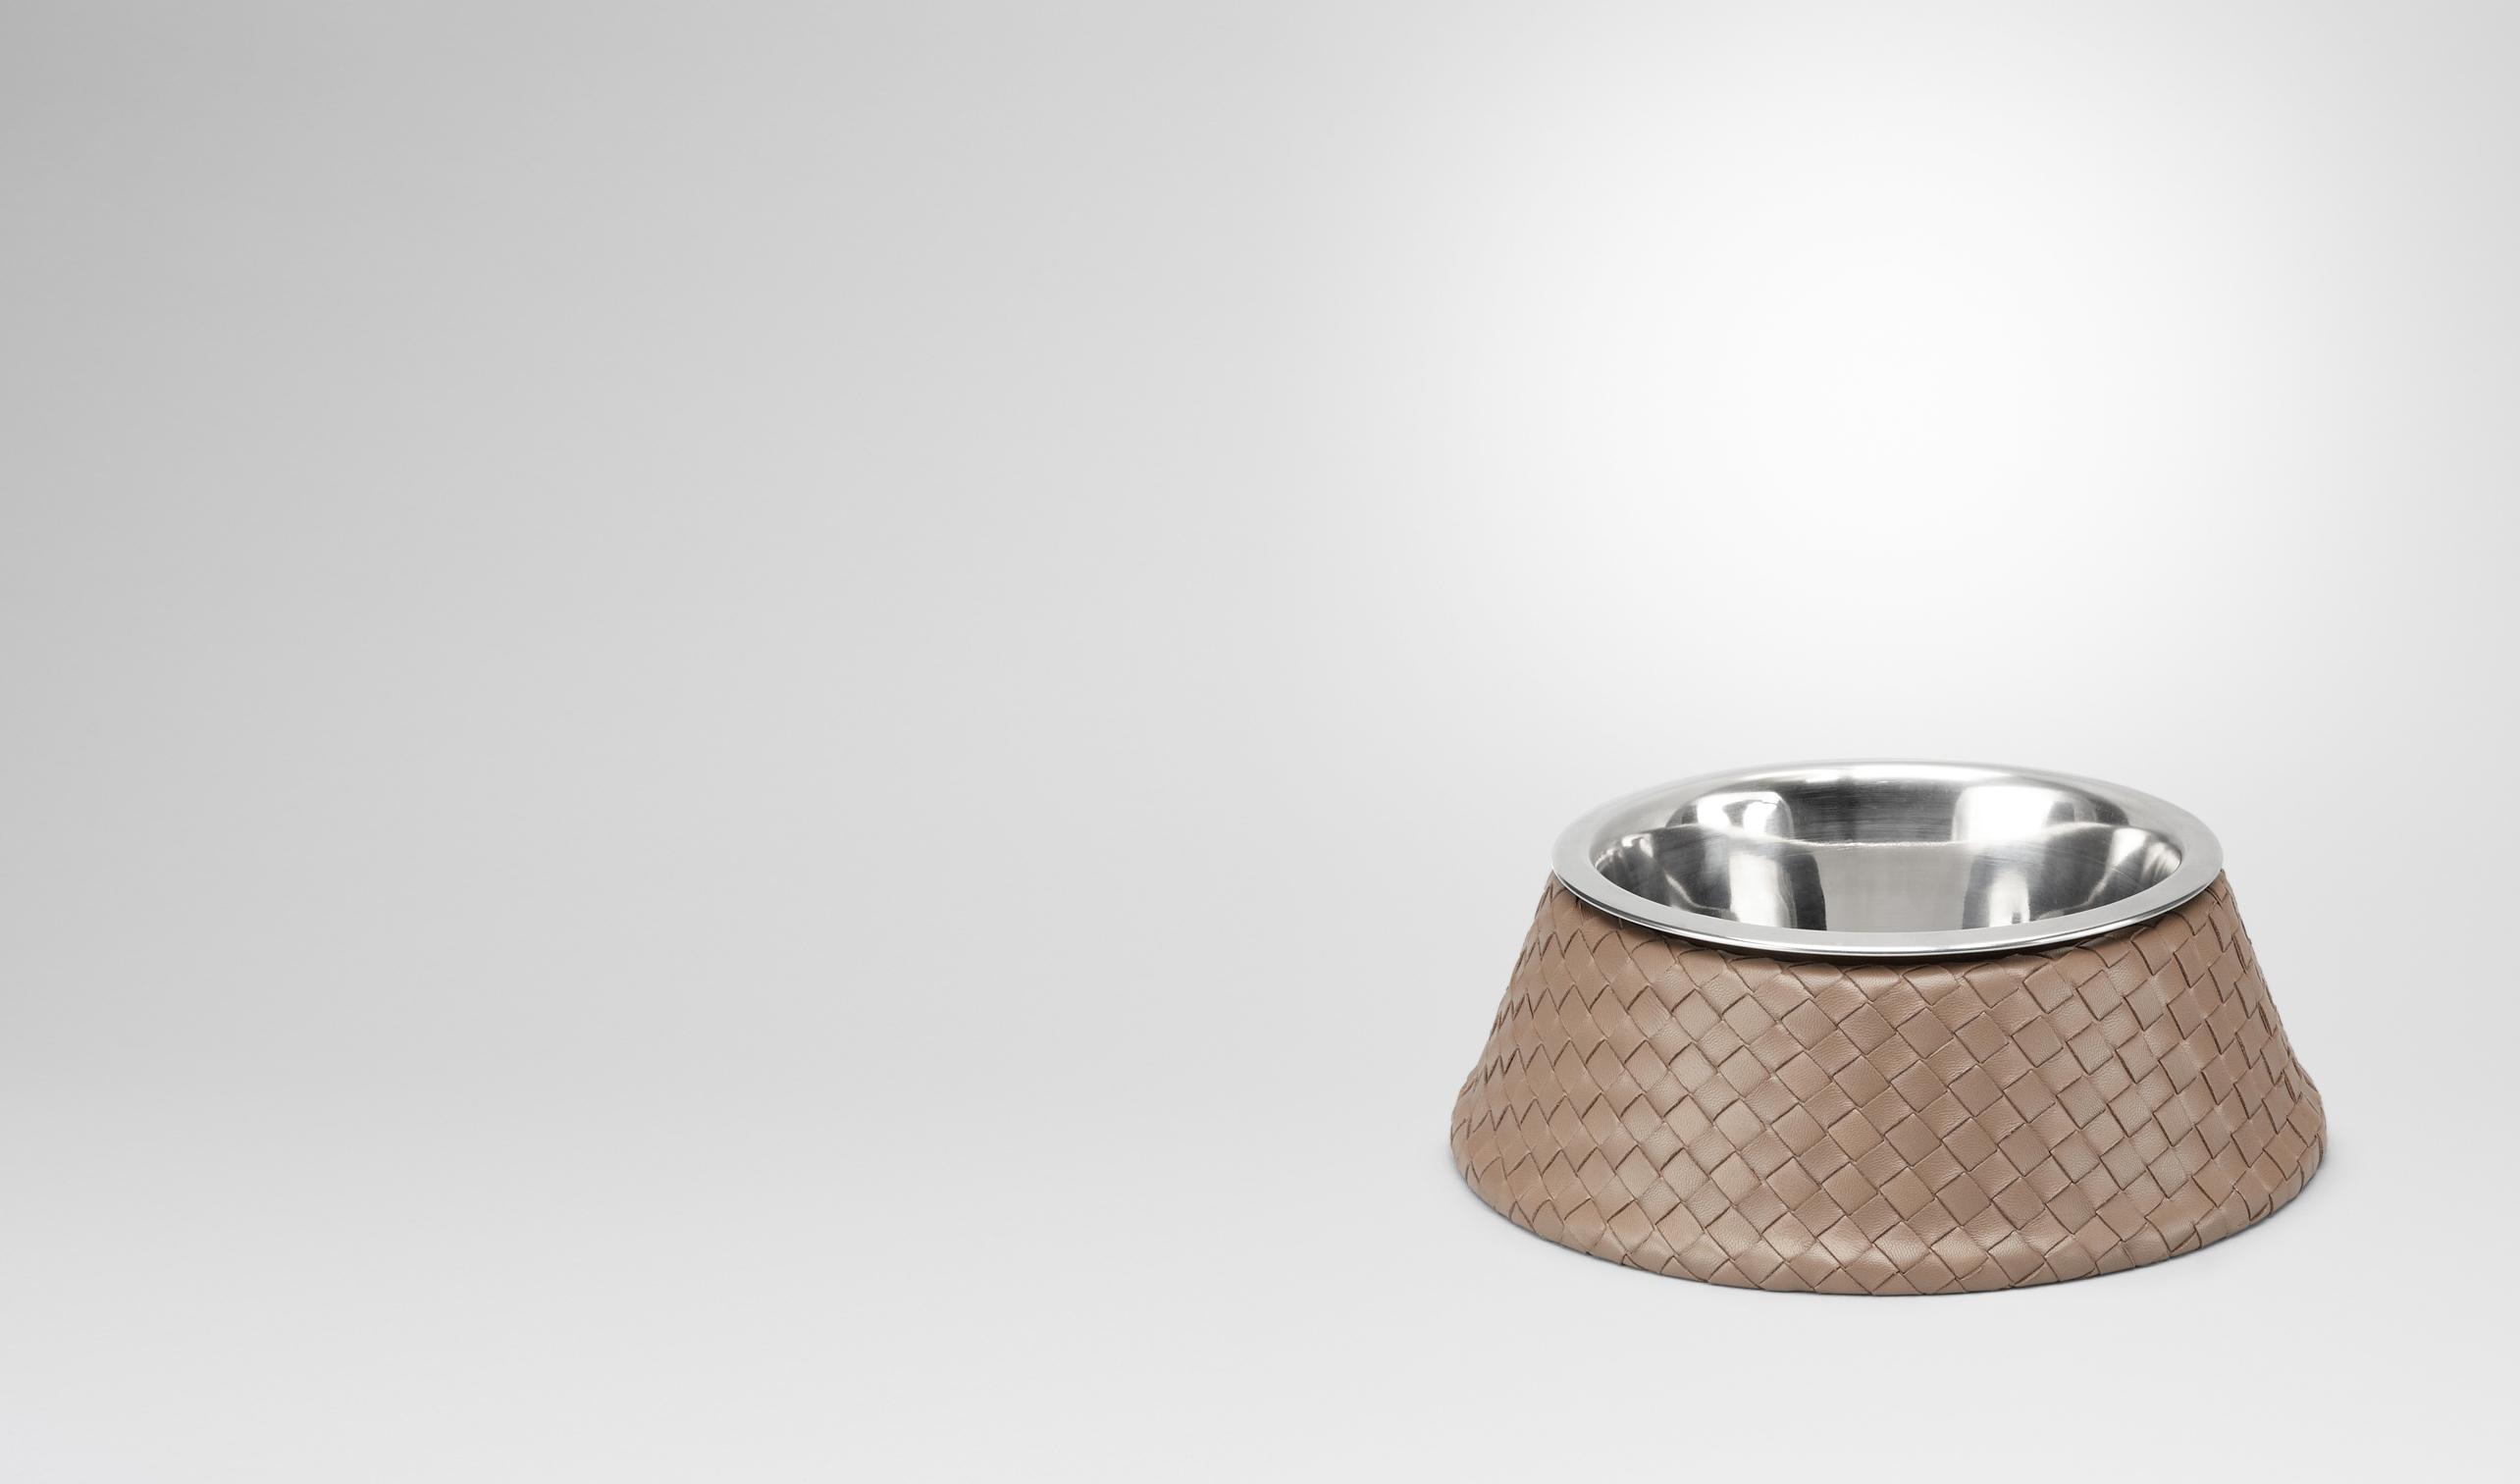 BOTTEGA VENETA Pet Accessory E Nero Palladio Intrecciato VN Brushed Steel Dog Bowl pl